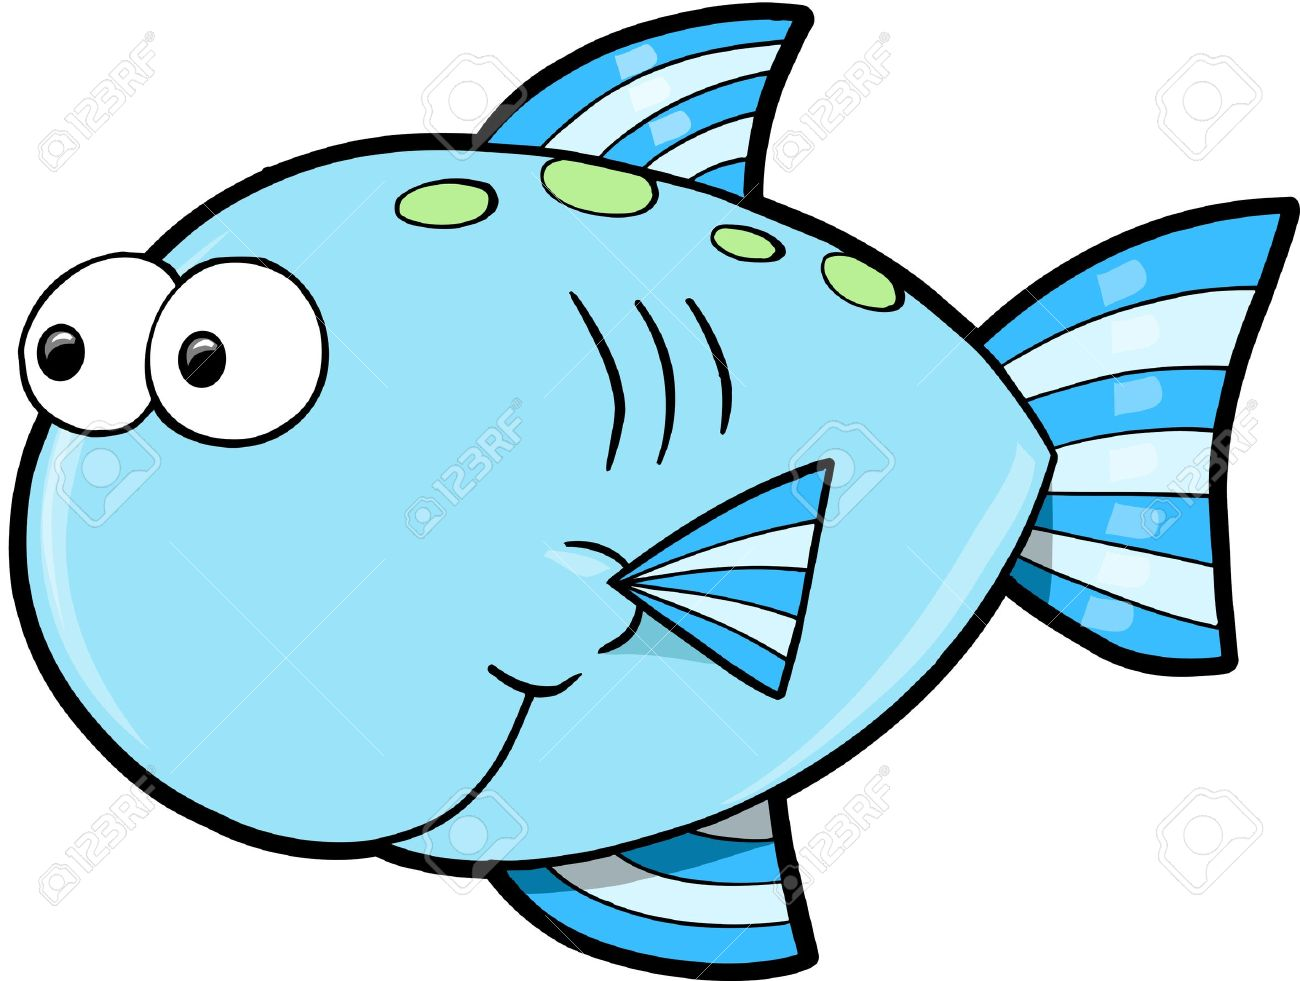 silly cute fish ocean vector illustration royalty free cliparts rh 123rf com cute cartoon fish drawings cute cartoon fish pictures